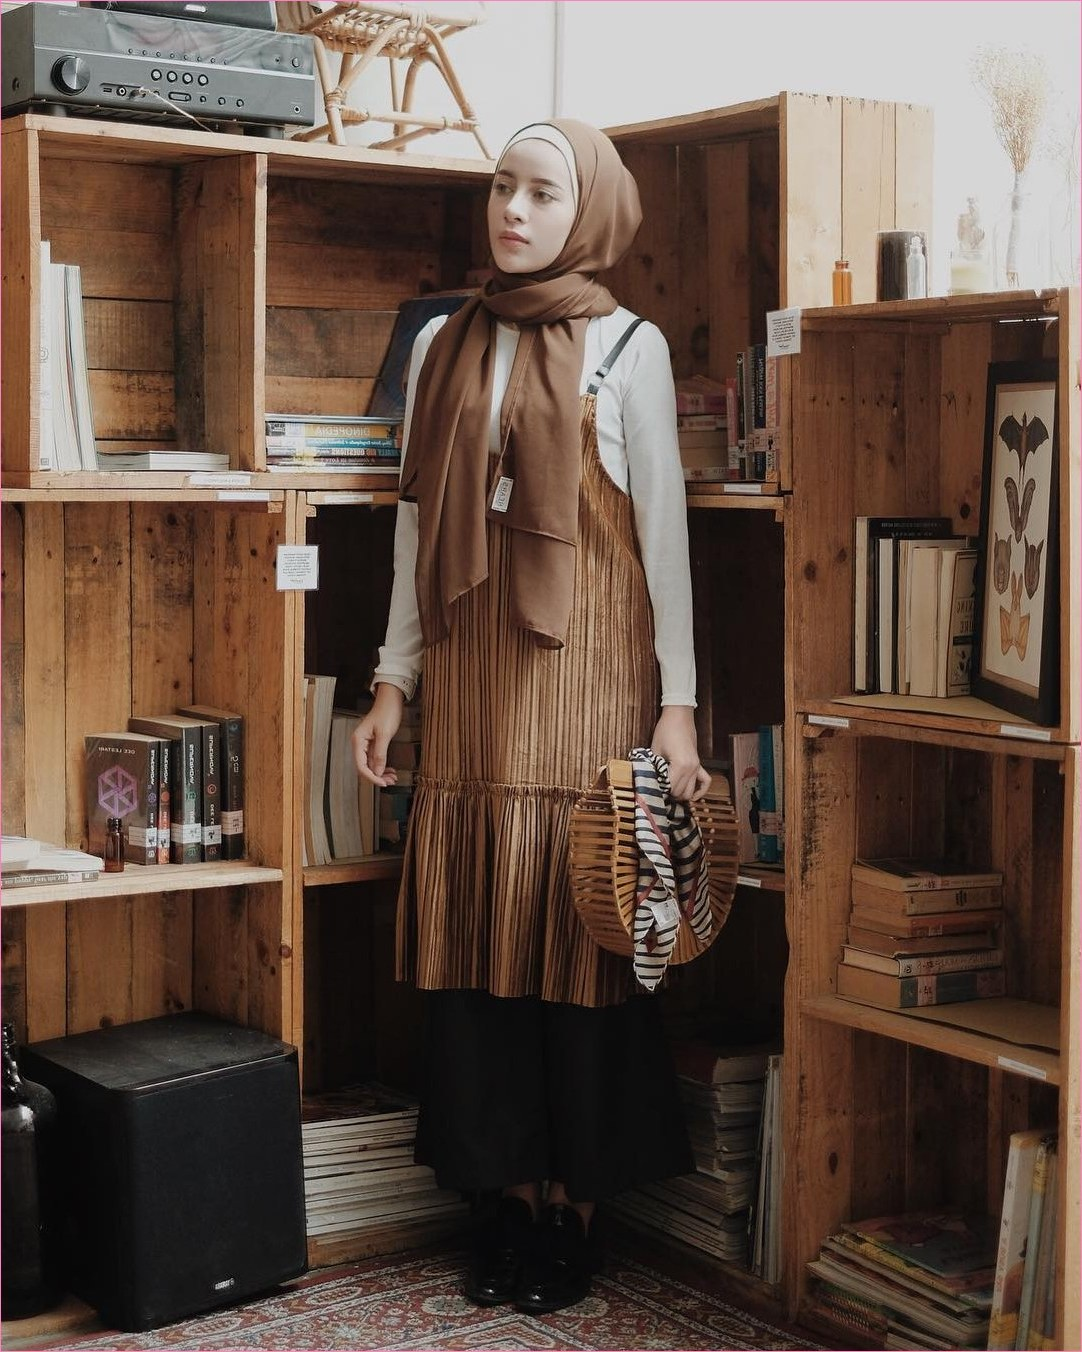 Model Rekomendasi Baju Lebaran 2019 Dwdk 80 Model Baju Lebaran Terbaru 2019 Muslimah Trendy Model